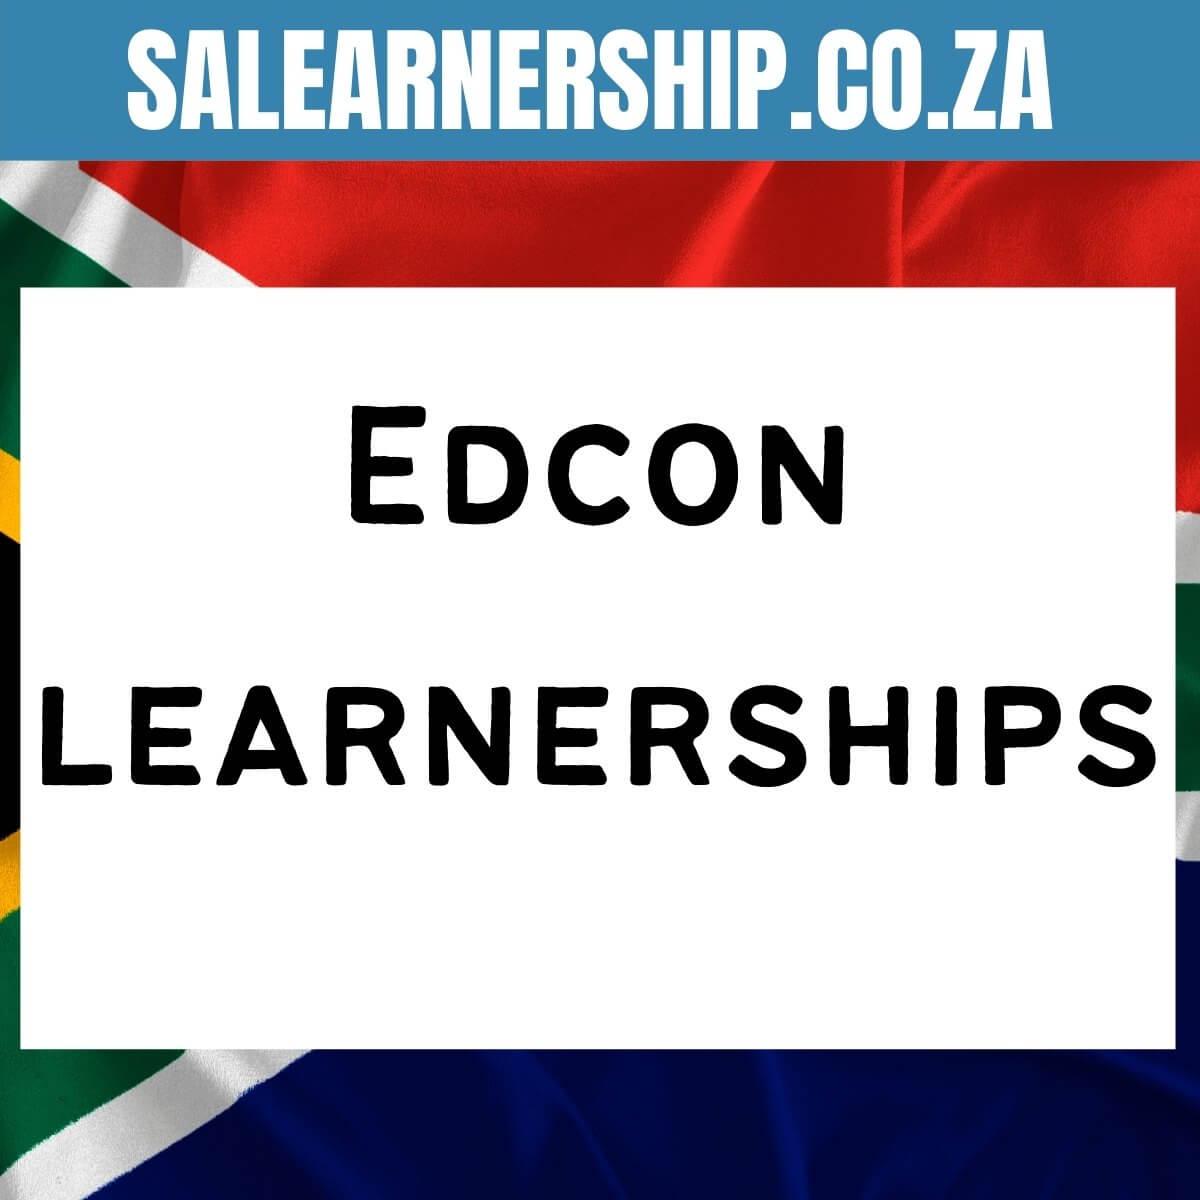 Edcon learnerships